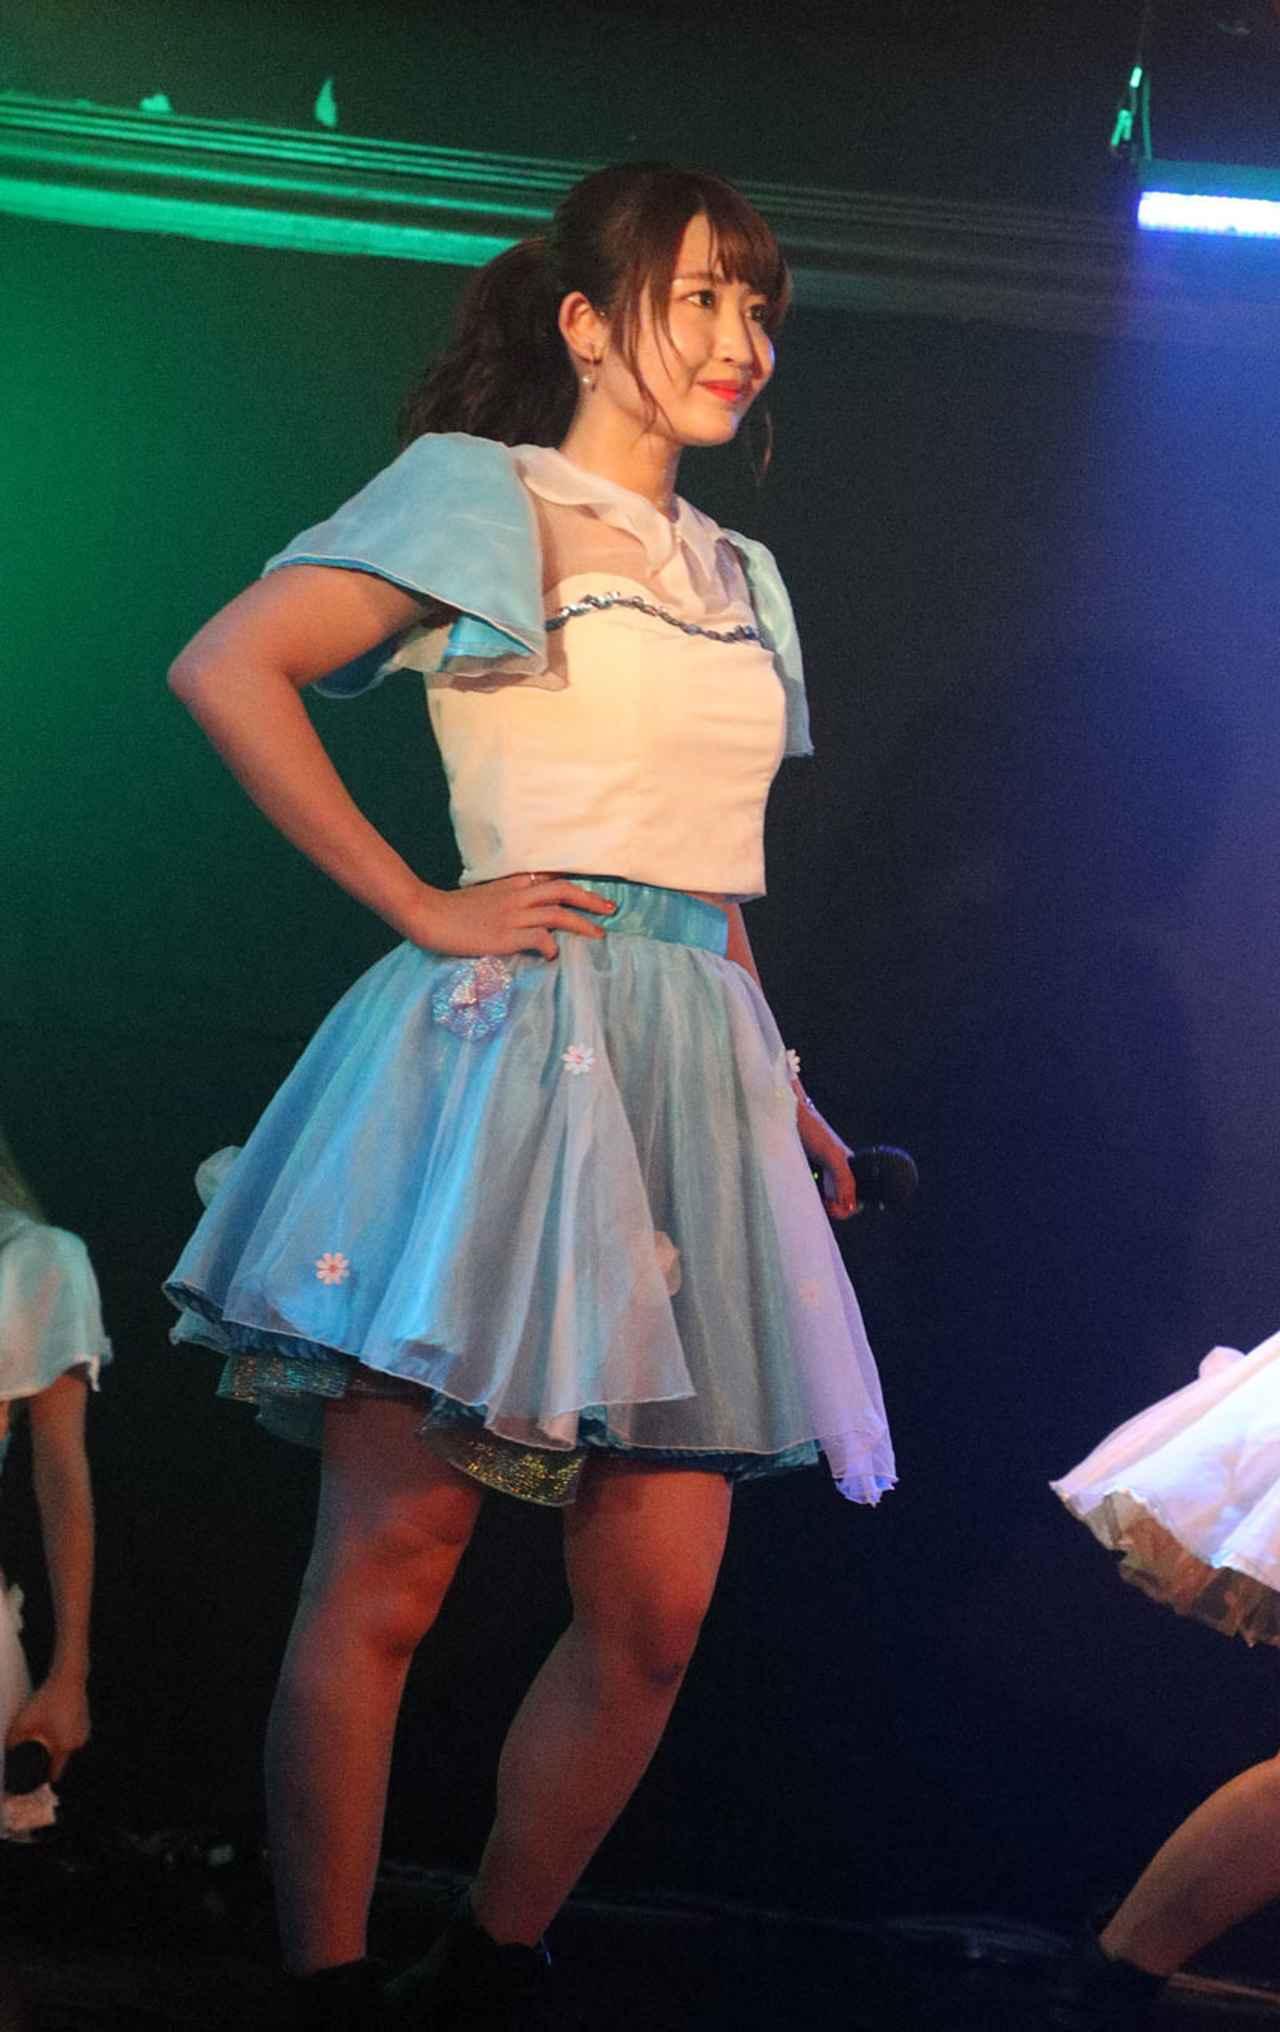 Images : 22番目の画像 - 「dela/ミスマガジングランプリ受賞者・沢口愛華を含む名古屋の人気アイドル・グループが、定例東京公演を開催。切れ味鋭いダンス、多彩な楽曲でファンを魅了」のアルバム - Stereo Sound ONLINE